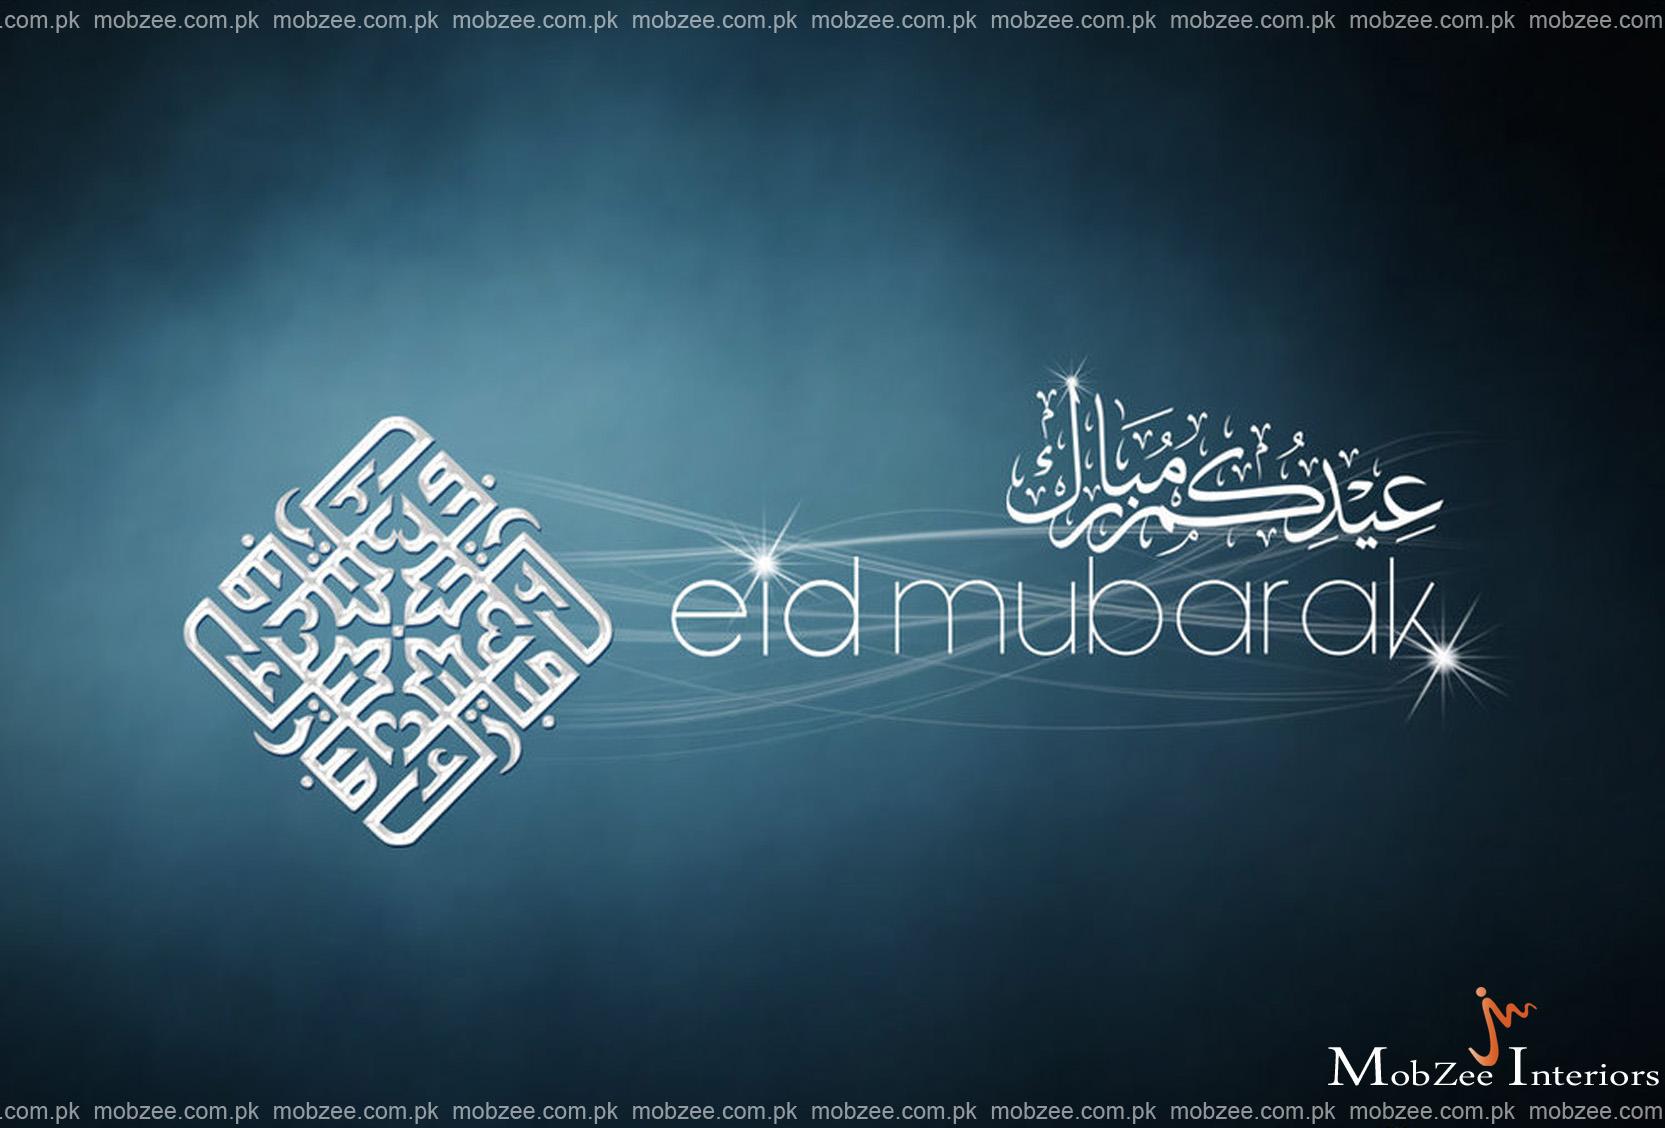 Belles Images Images Eid Special Hd Fond Décran And Background